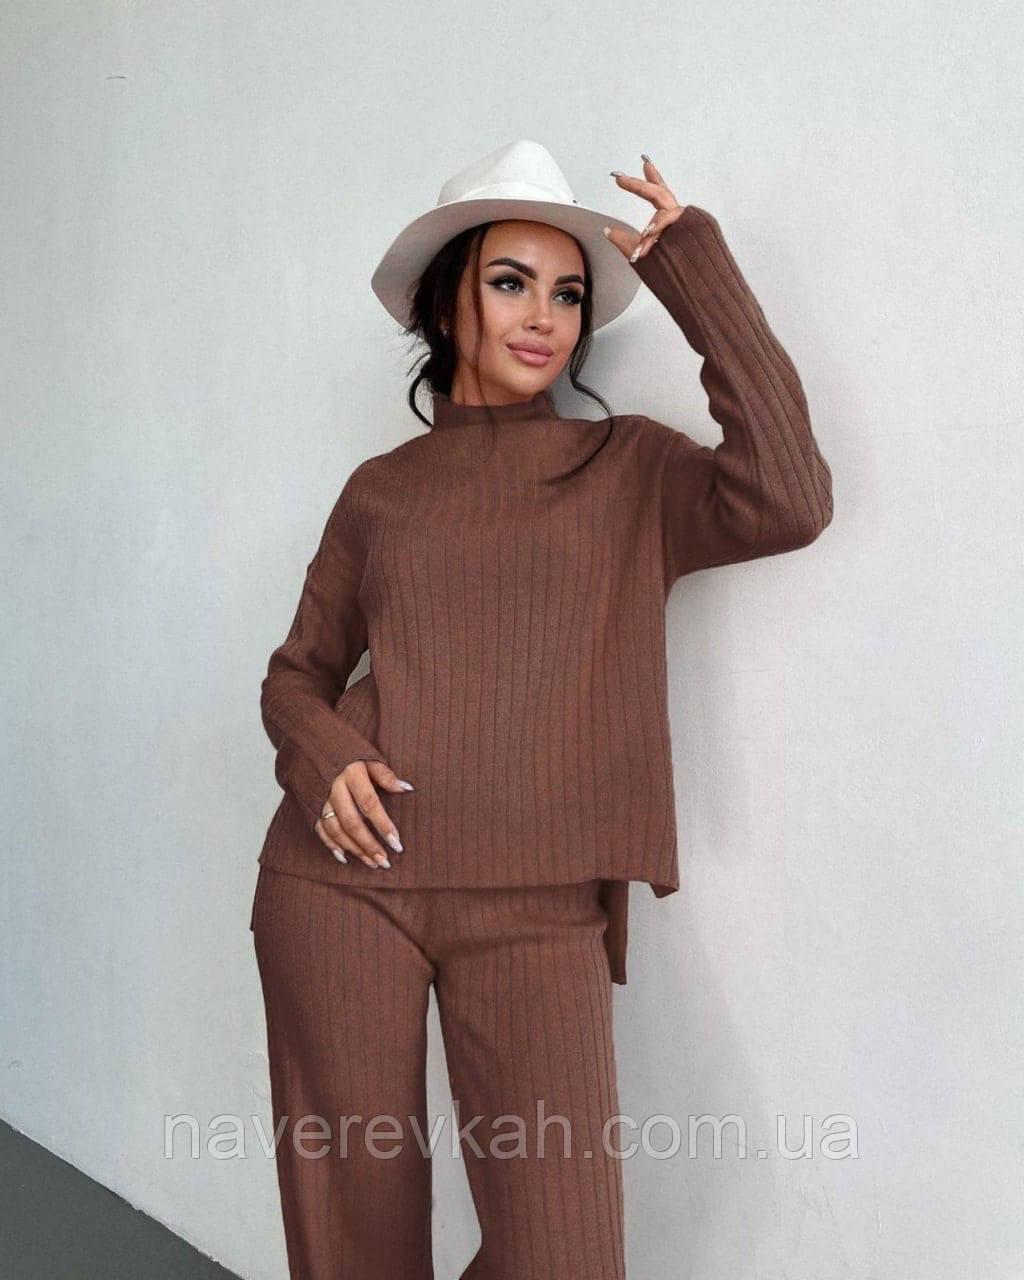 Жіночий ангоровый костюм з широкими брюками палаццо чорний беж оликовый мокко 42-44 46-48 теплий рубчик